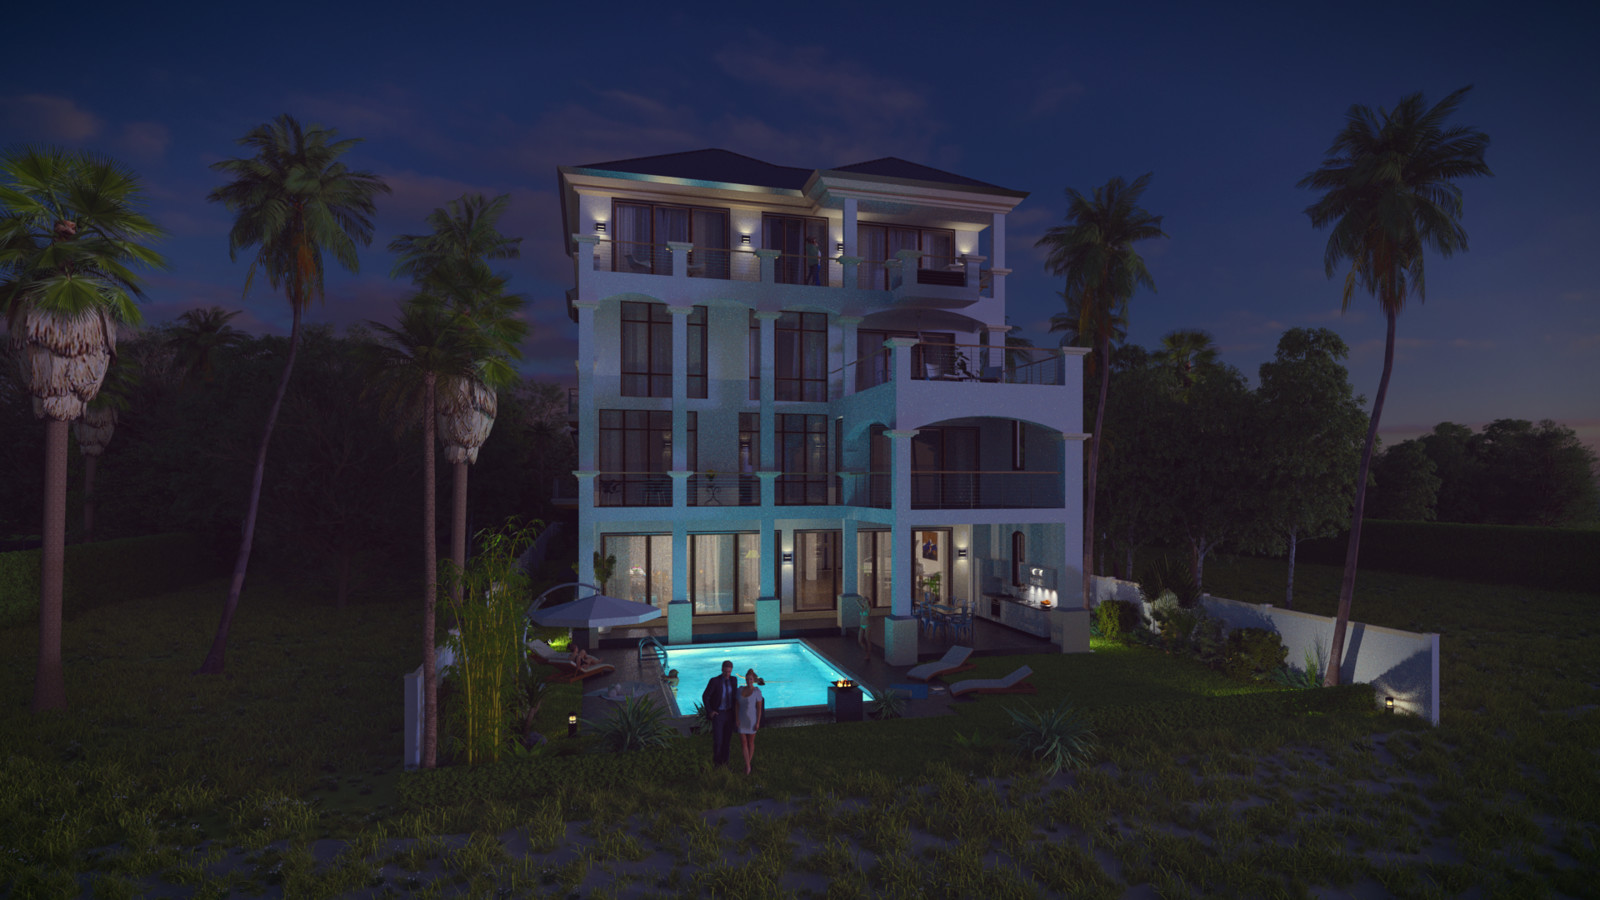 SketchUp + Thea Render  Seagrove Beach House: Scene 54 2pt Studio Night A Lumina 1920 × 1080 Presto MC Bucket